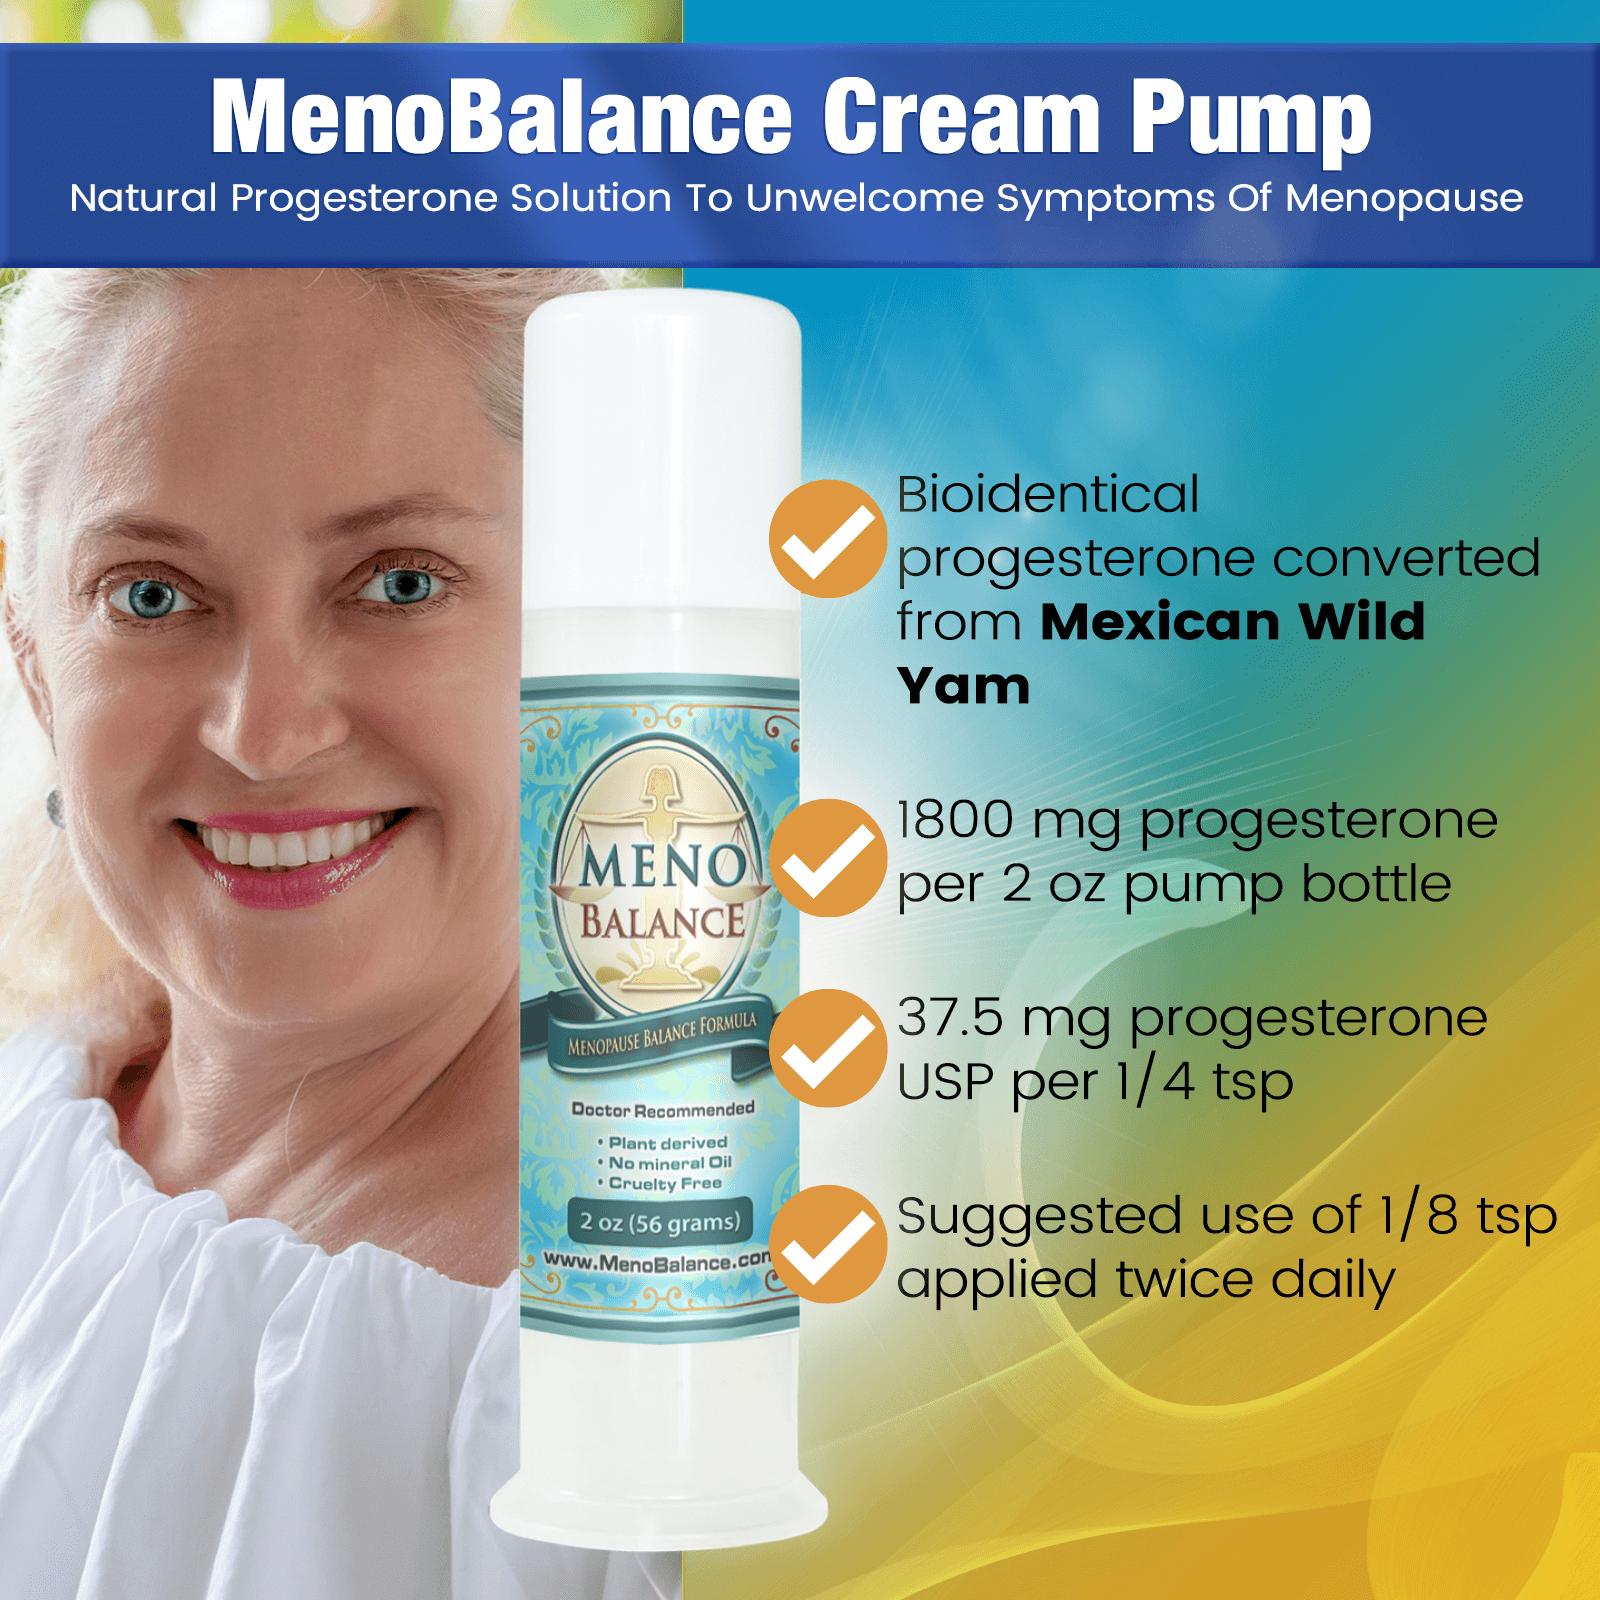 Menobalance Best Progesterone Cream for Menopause WFP Infographic